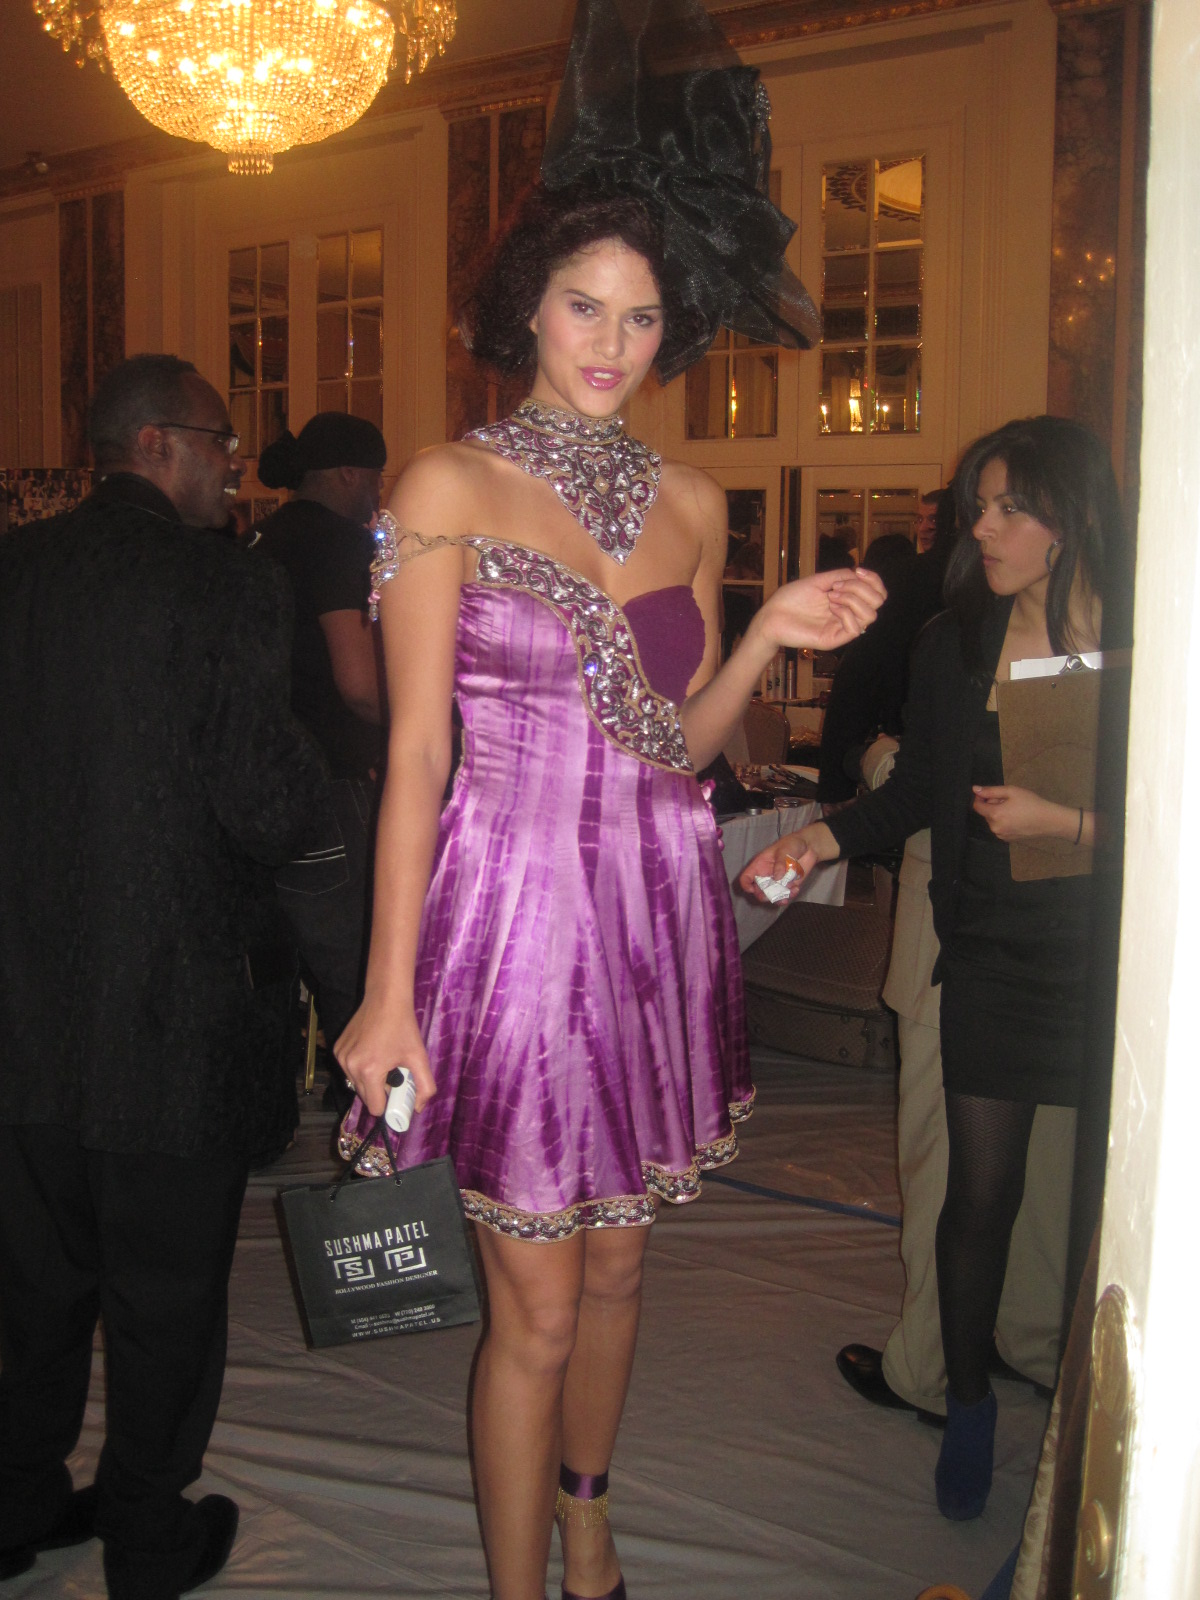 http://4.bp.blogspot.com/-rZYqrq5Pvvw/TWcDlVbiJuI/AAAAAAAAAM0/-q8r6nZB_g4/s1600/Couture+Fashion+Weekend+2011+027.JPG